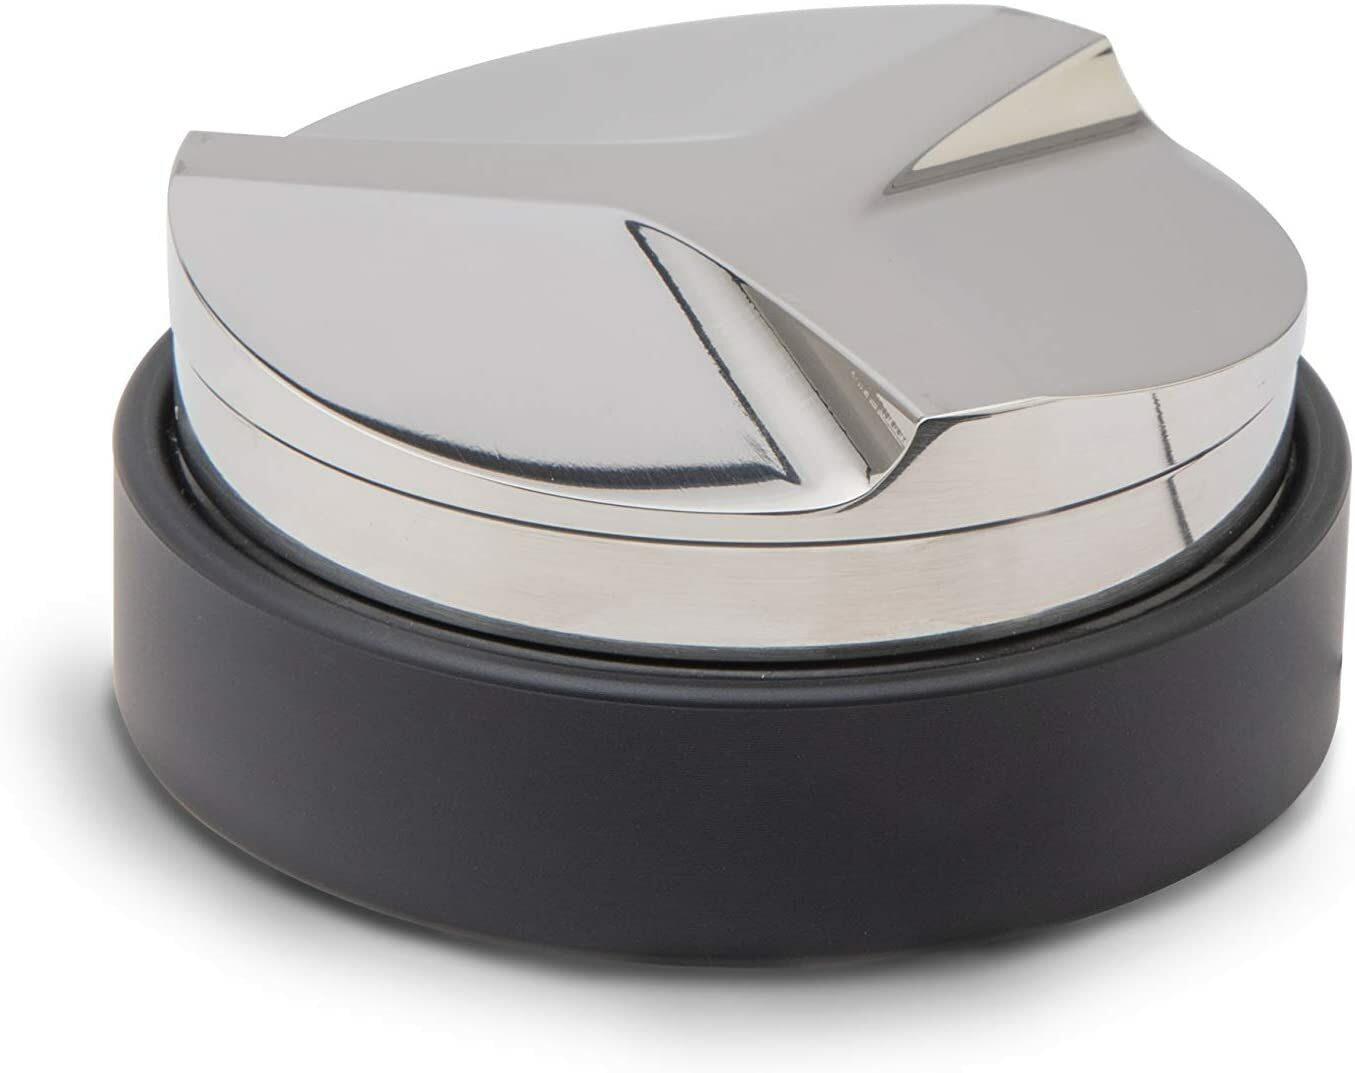 Lelit PLA482A Levelling Tool 58,55 mm - schwarz chrom